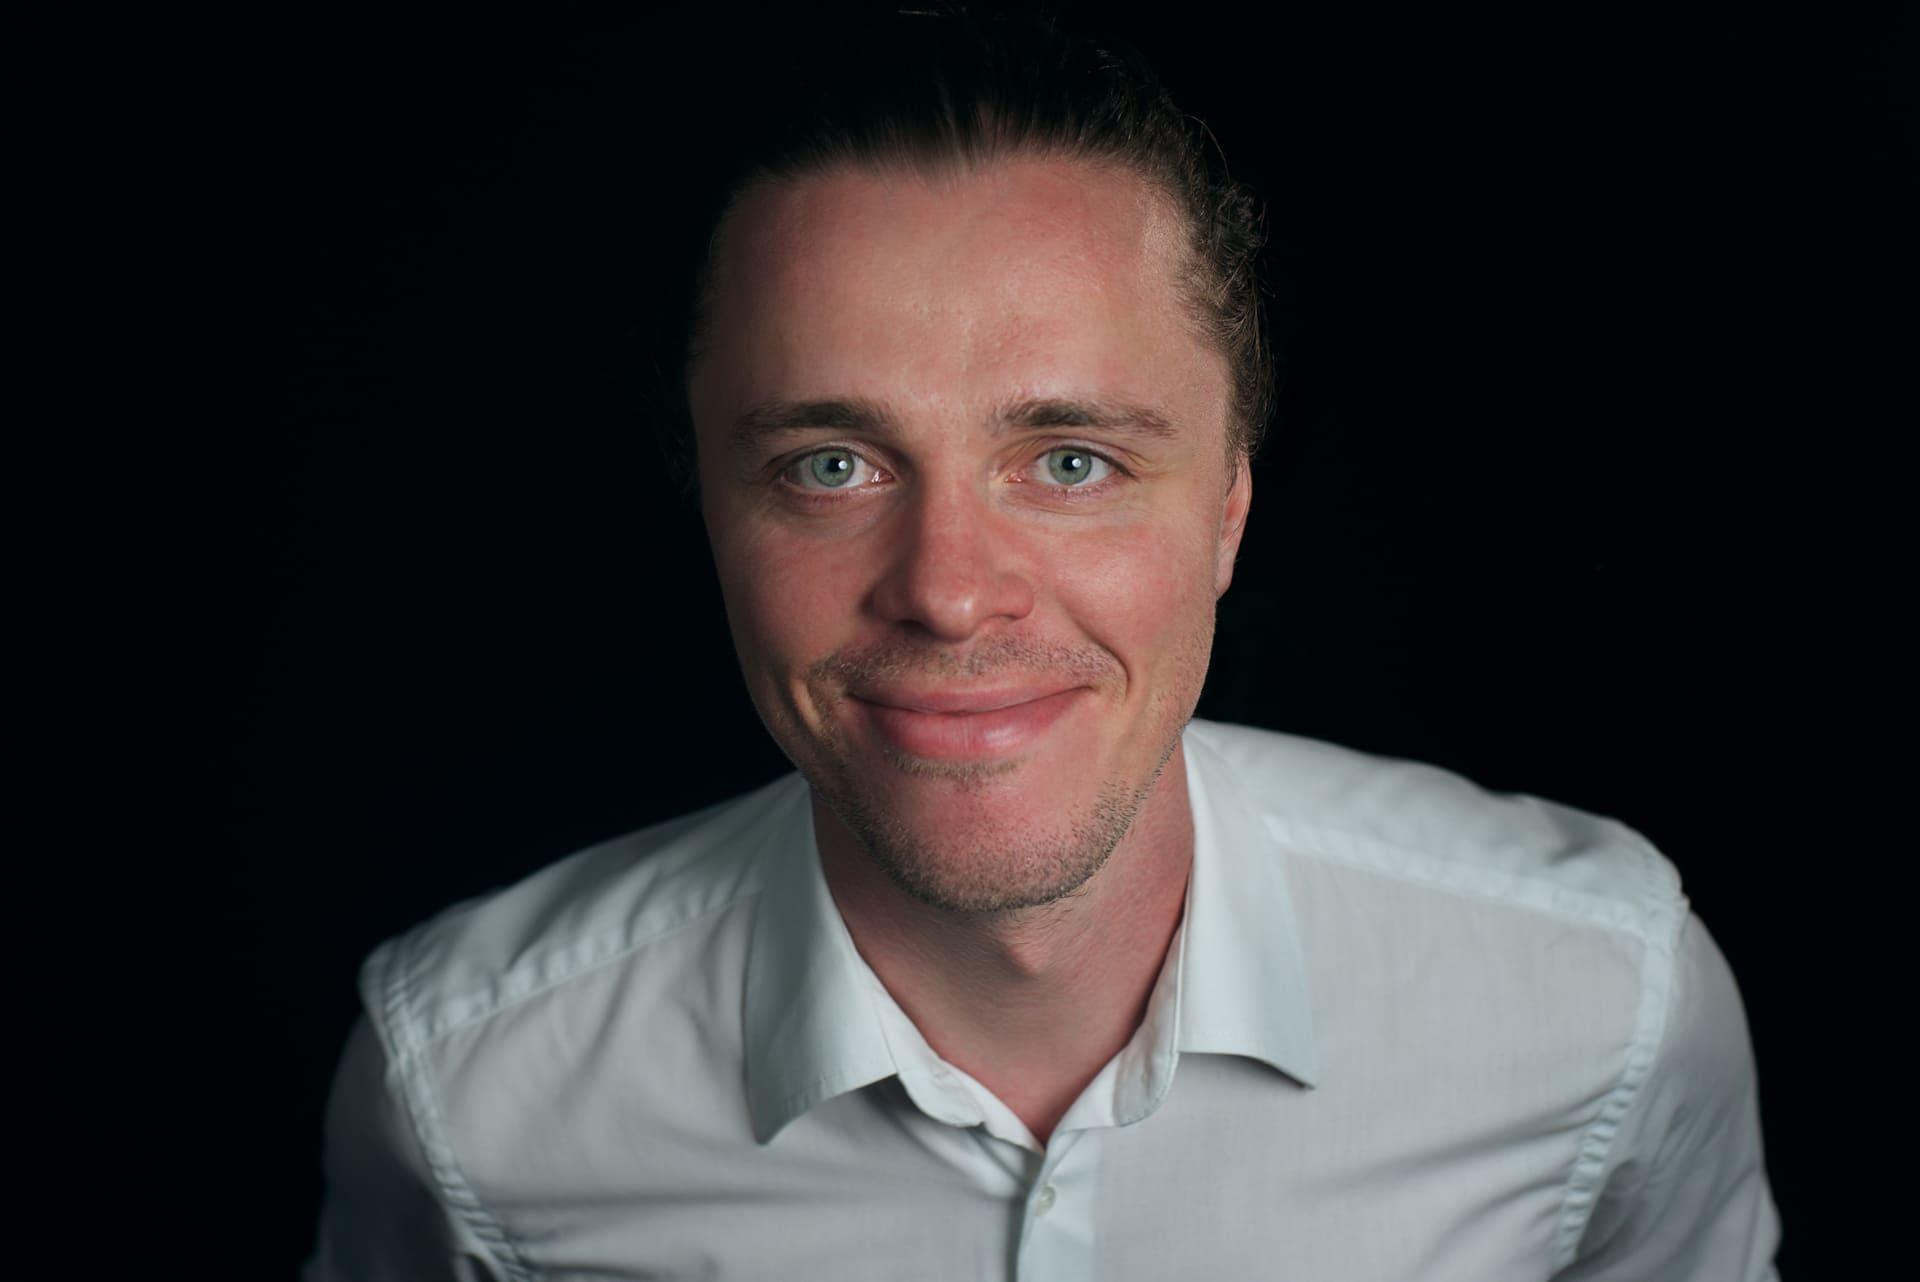 David Risberg 5 - photo by Helgi Reynisson